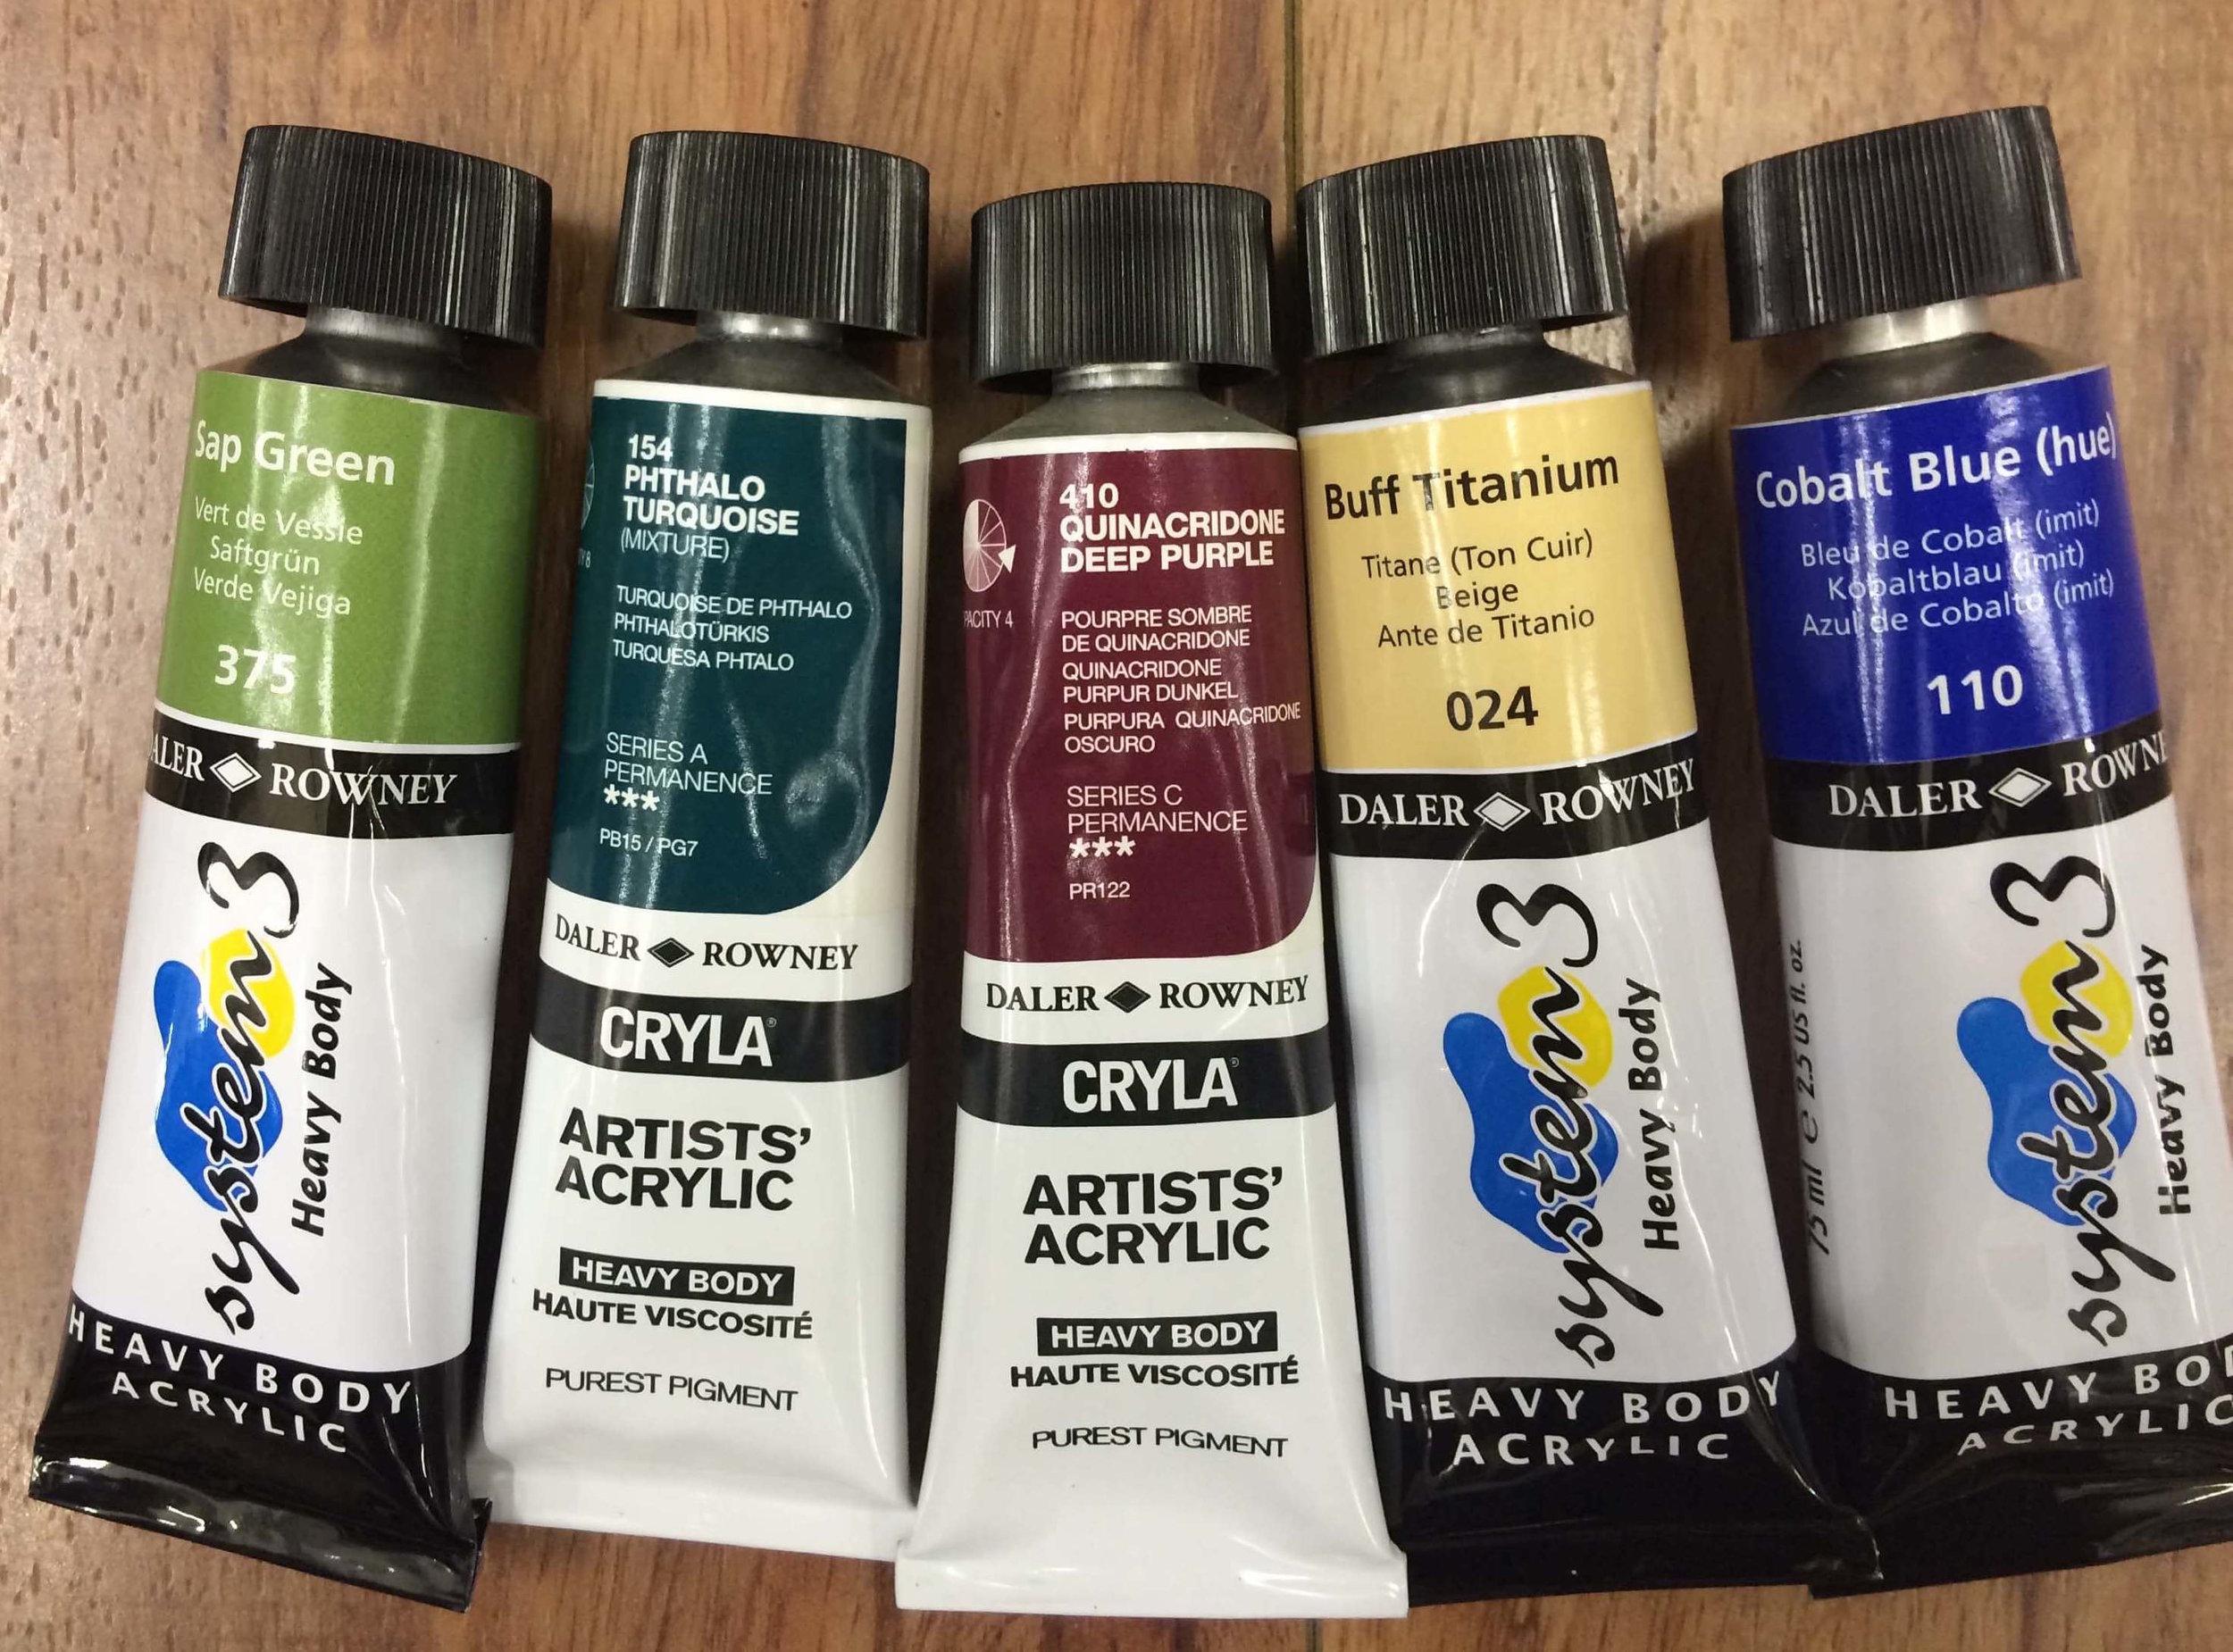 Daler Rowney   Heavy Body Acrylic : Sap Green, Phthalo Turquoise   (CRYLA - Artists' Quality), Quinacridone Deep Purple   (CRYLA - Artists' Quality), Buff Titanium, Cobalt Blue (Hue)